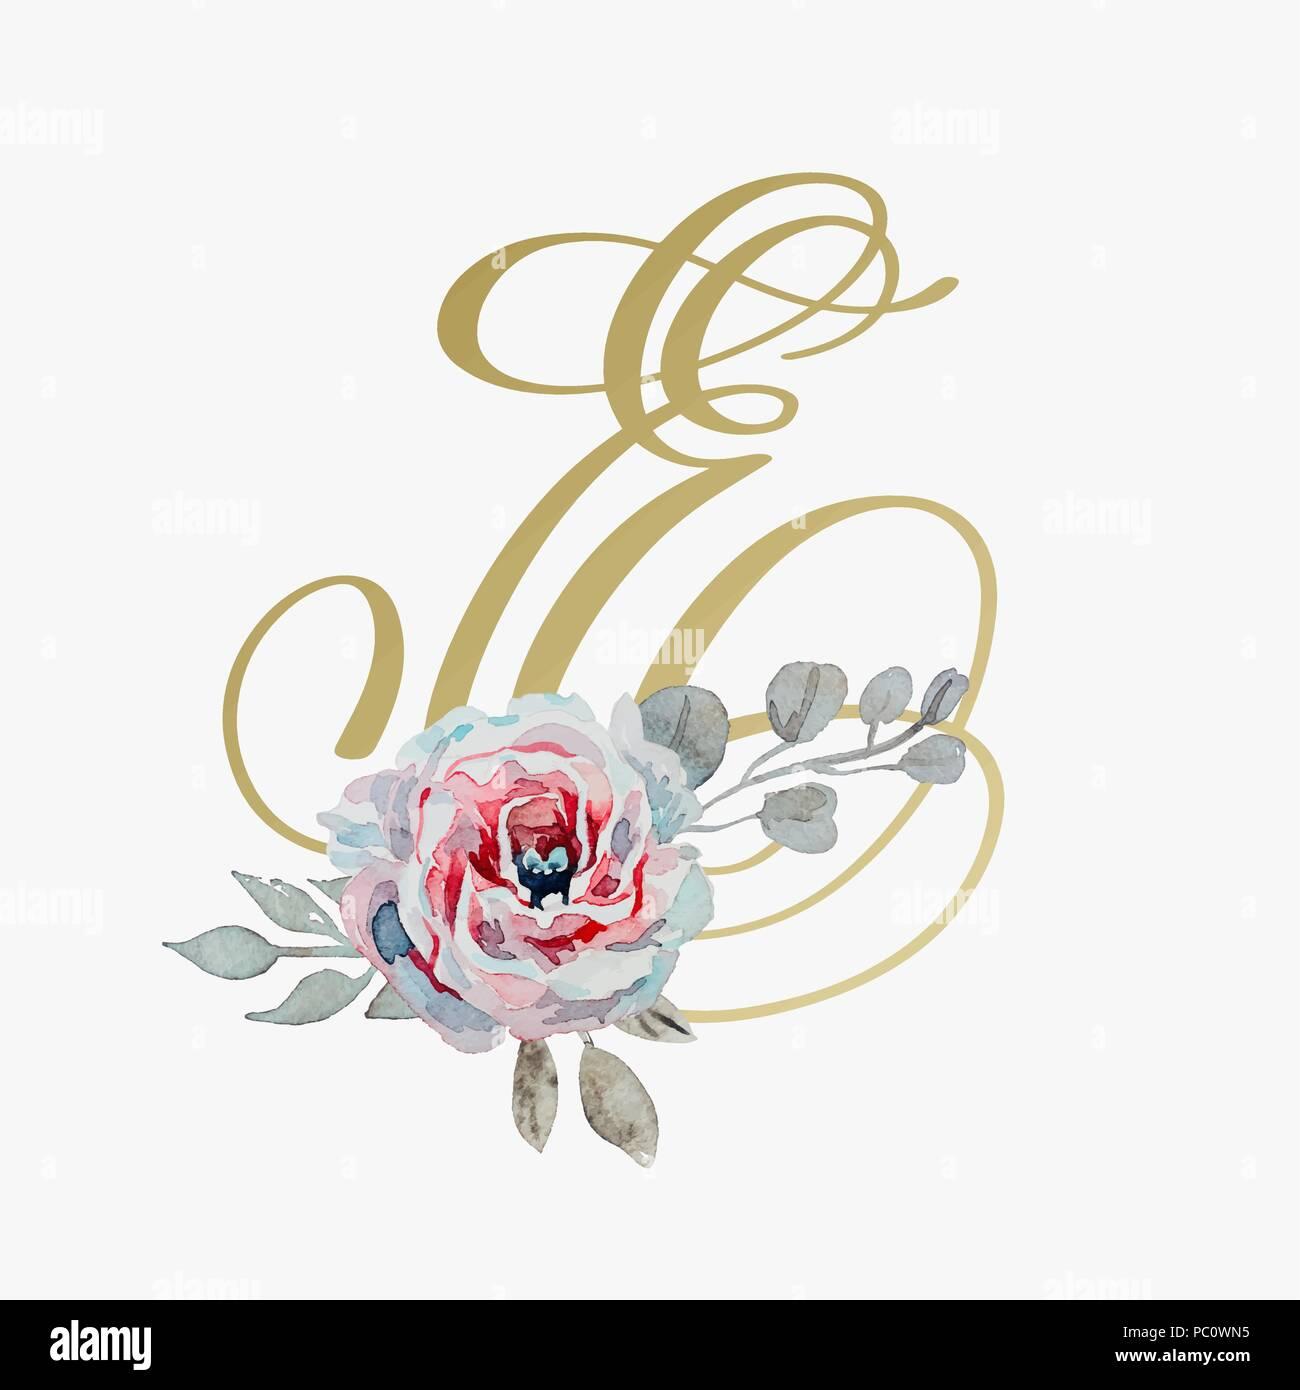 Golden Hand Lettering Font With Handmade Rose Flower Calligraphy